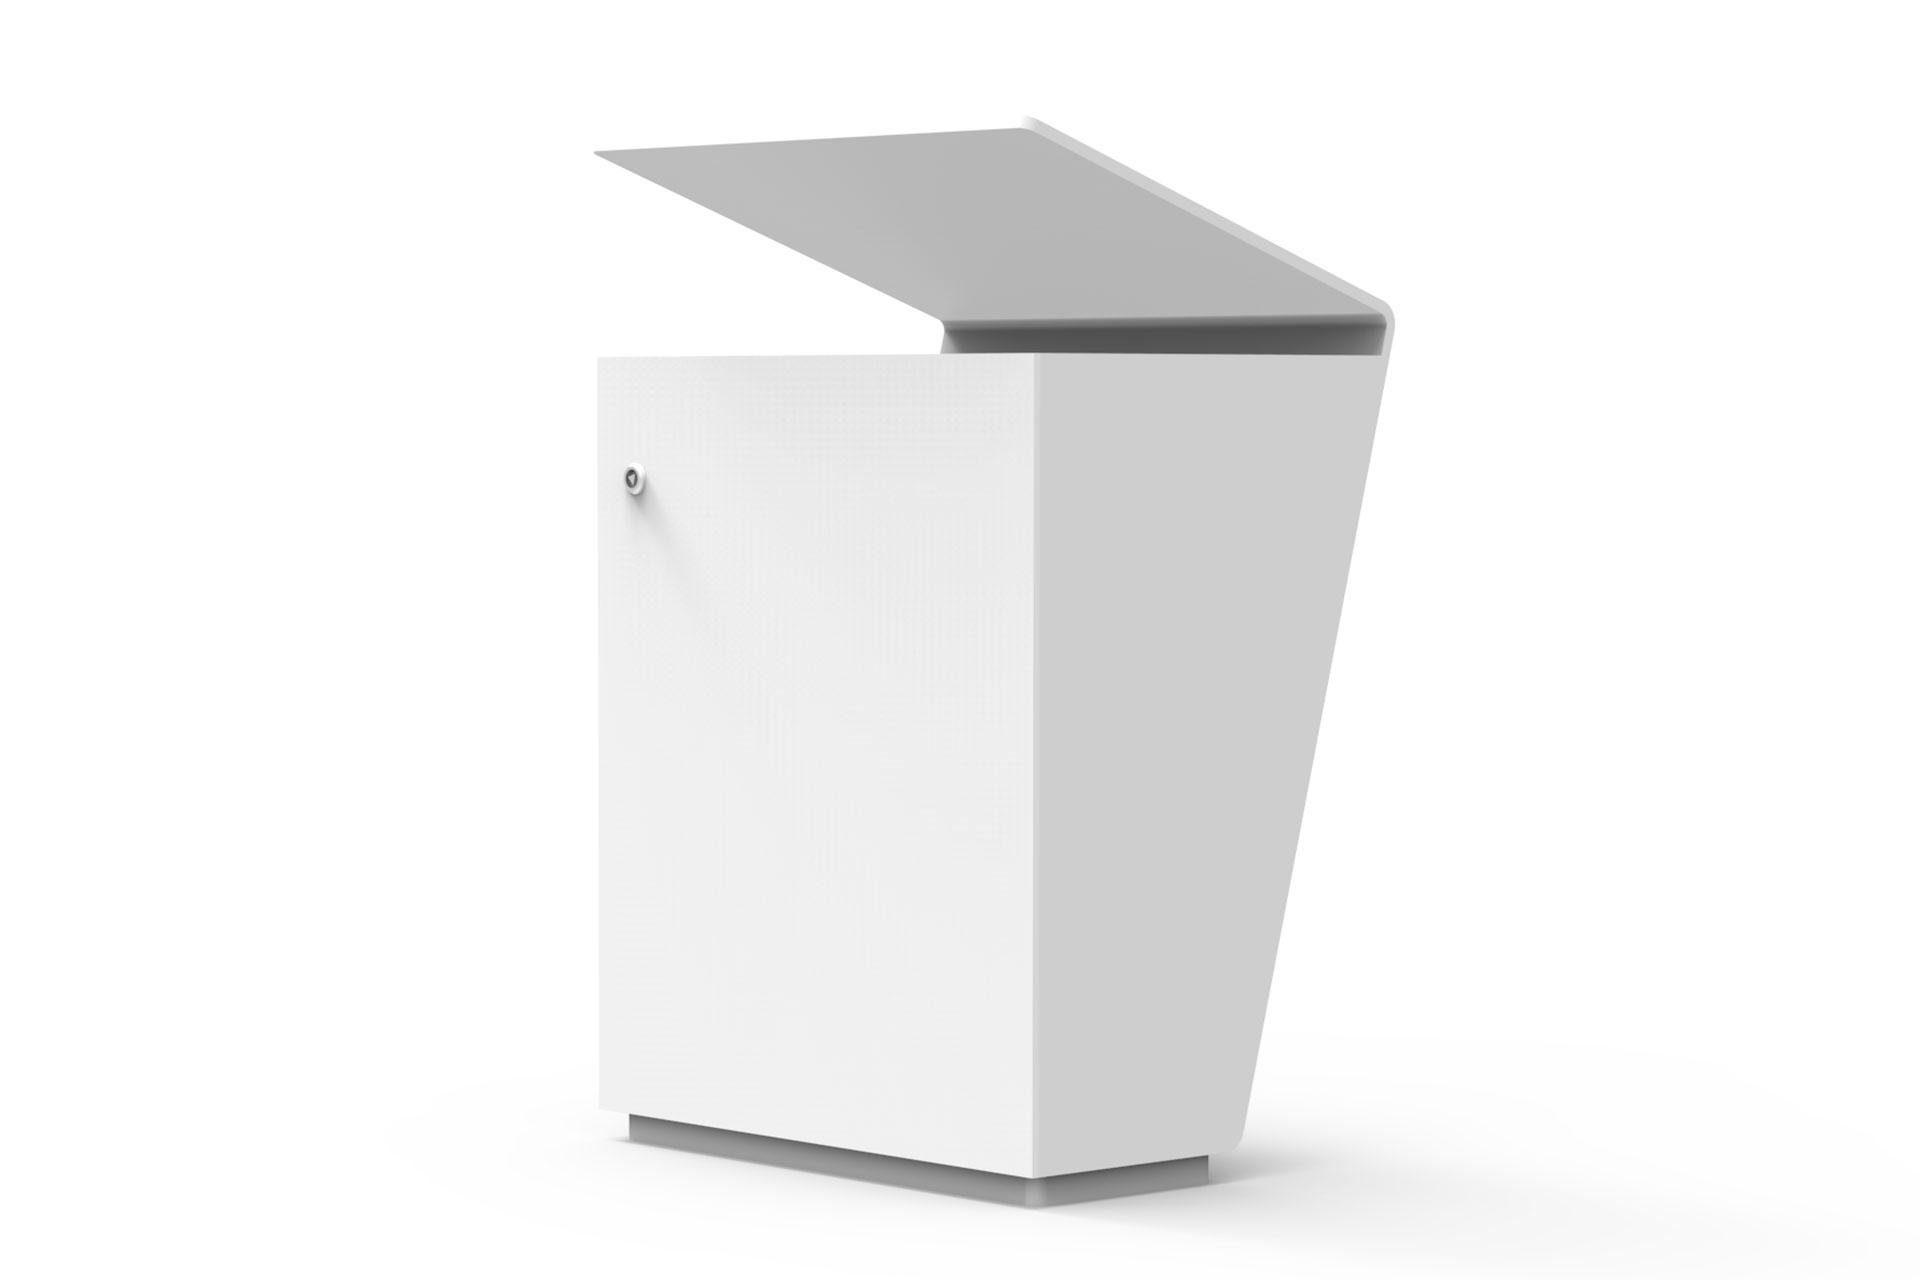 UrbanObjekts Oco Abfallbehälter